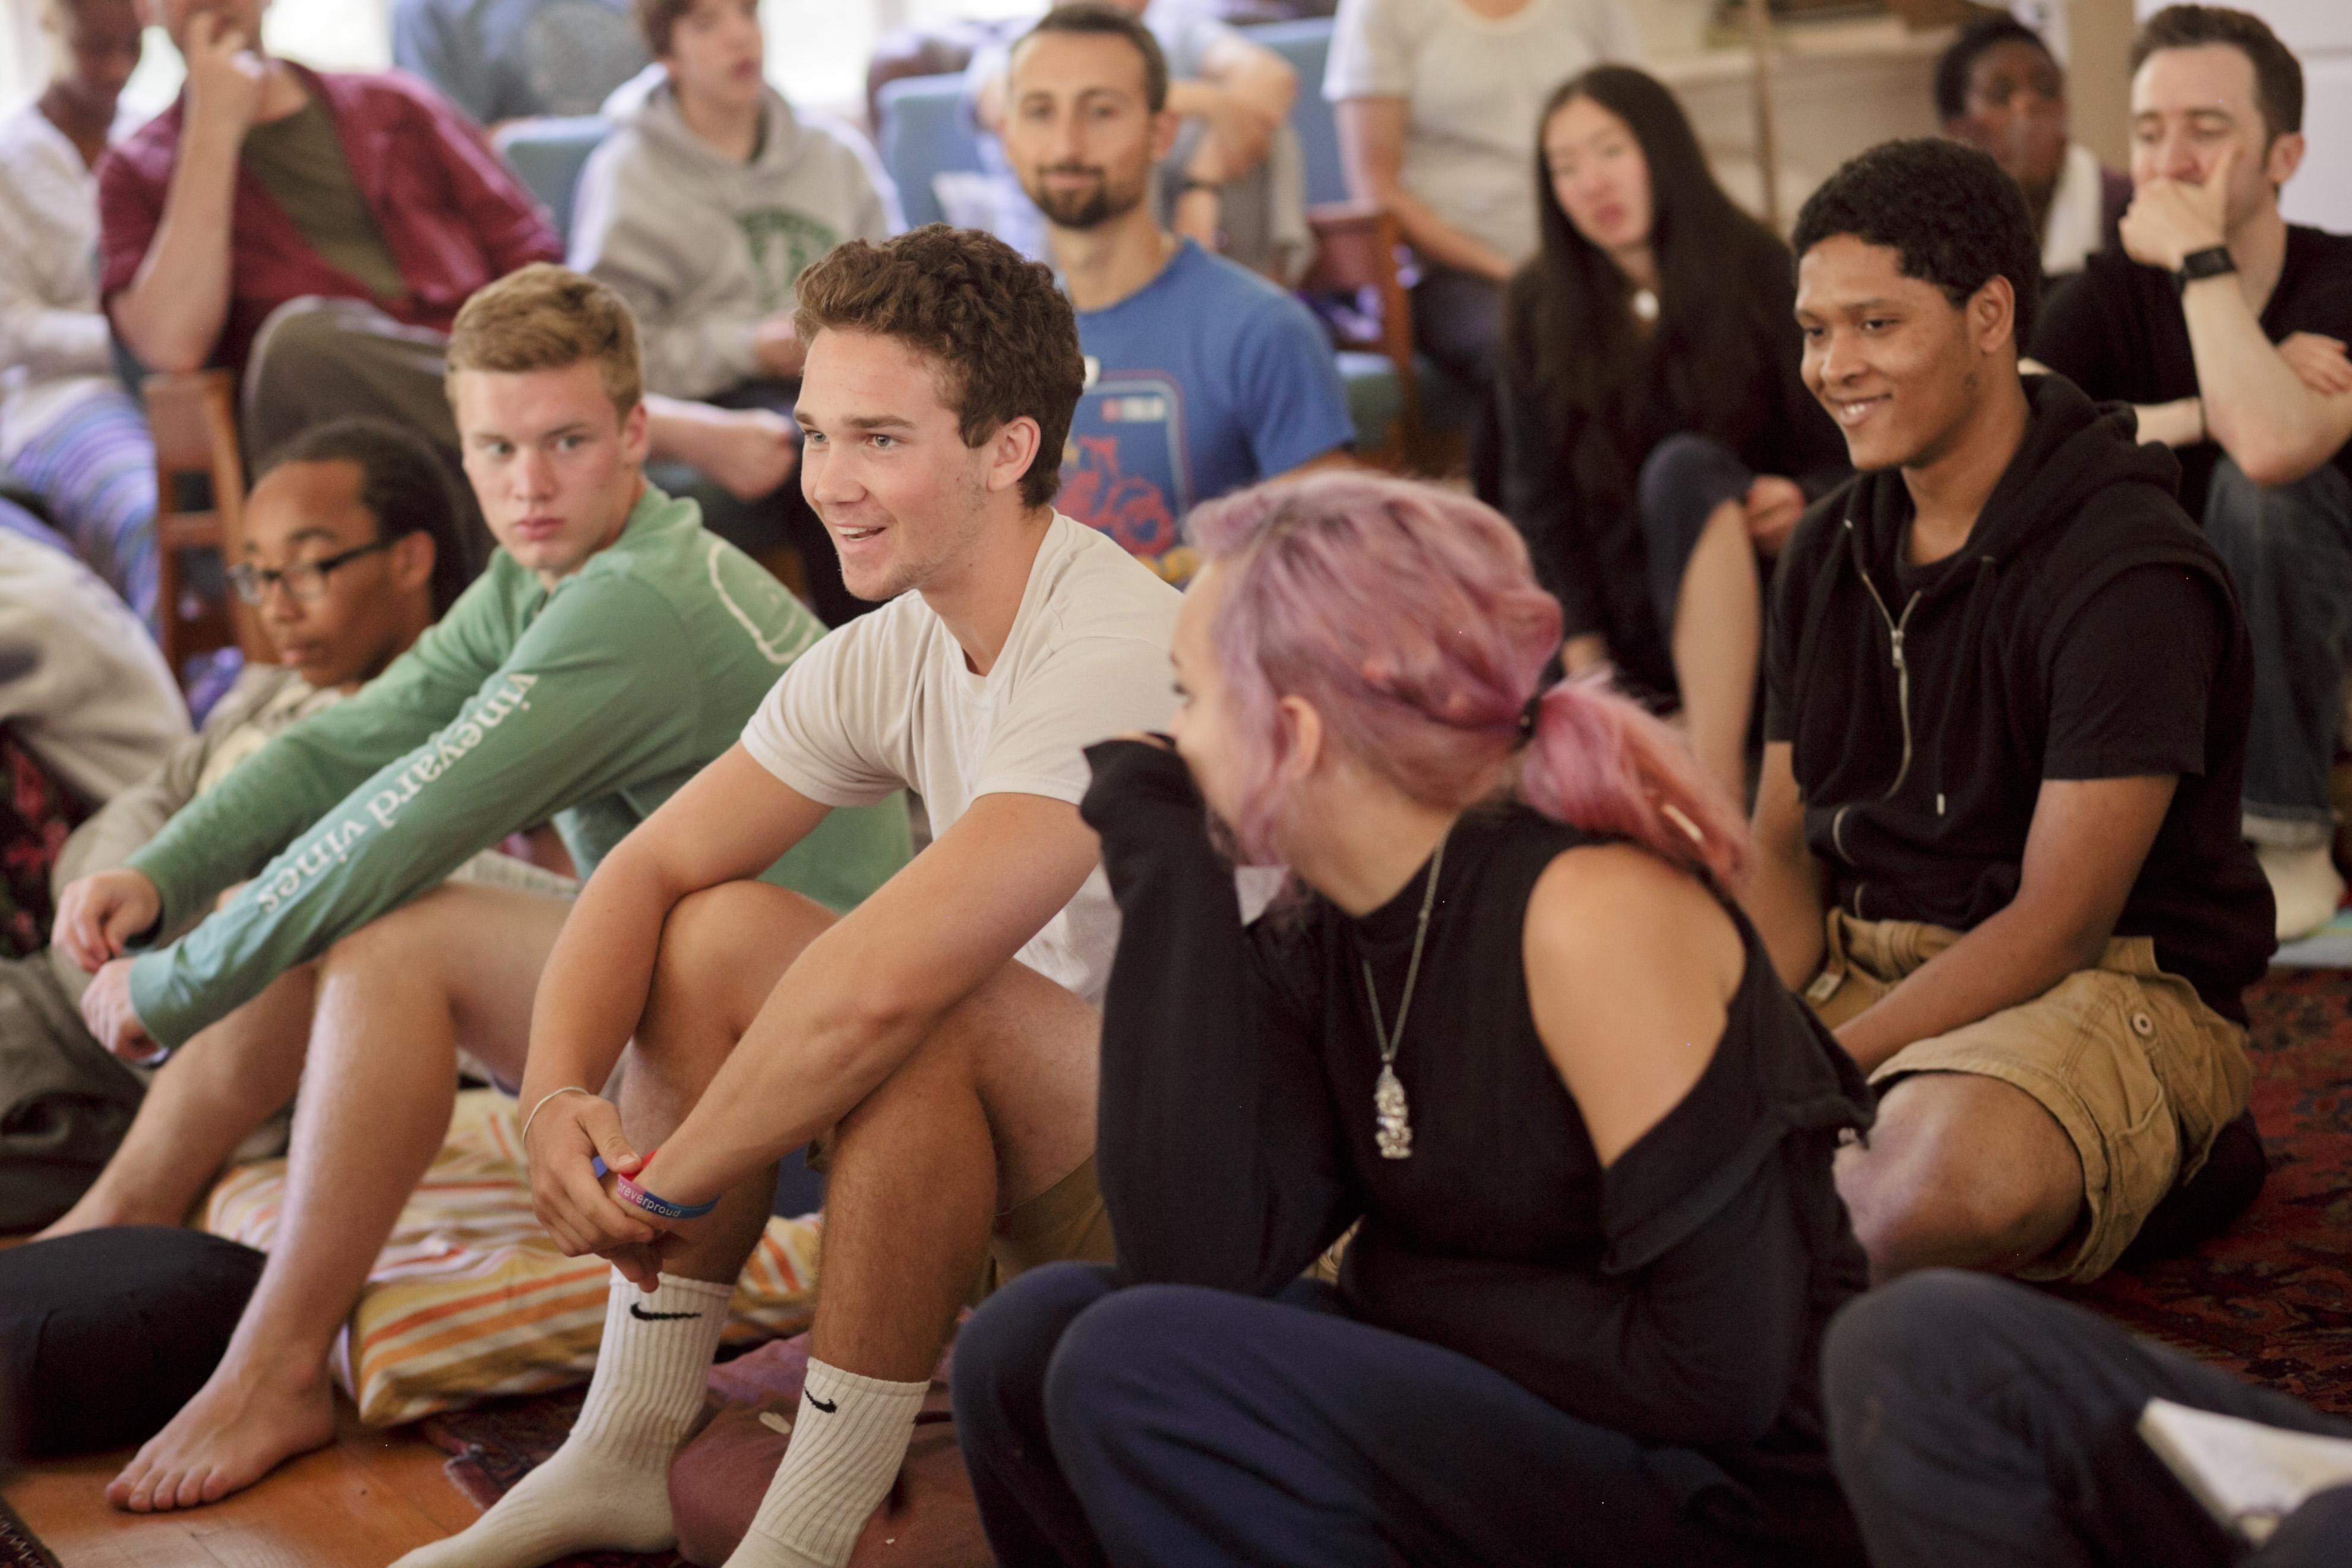 Summer Program - Stress Reduction | Inward Bound Mindfulness Education: UK Retreat for Young People